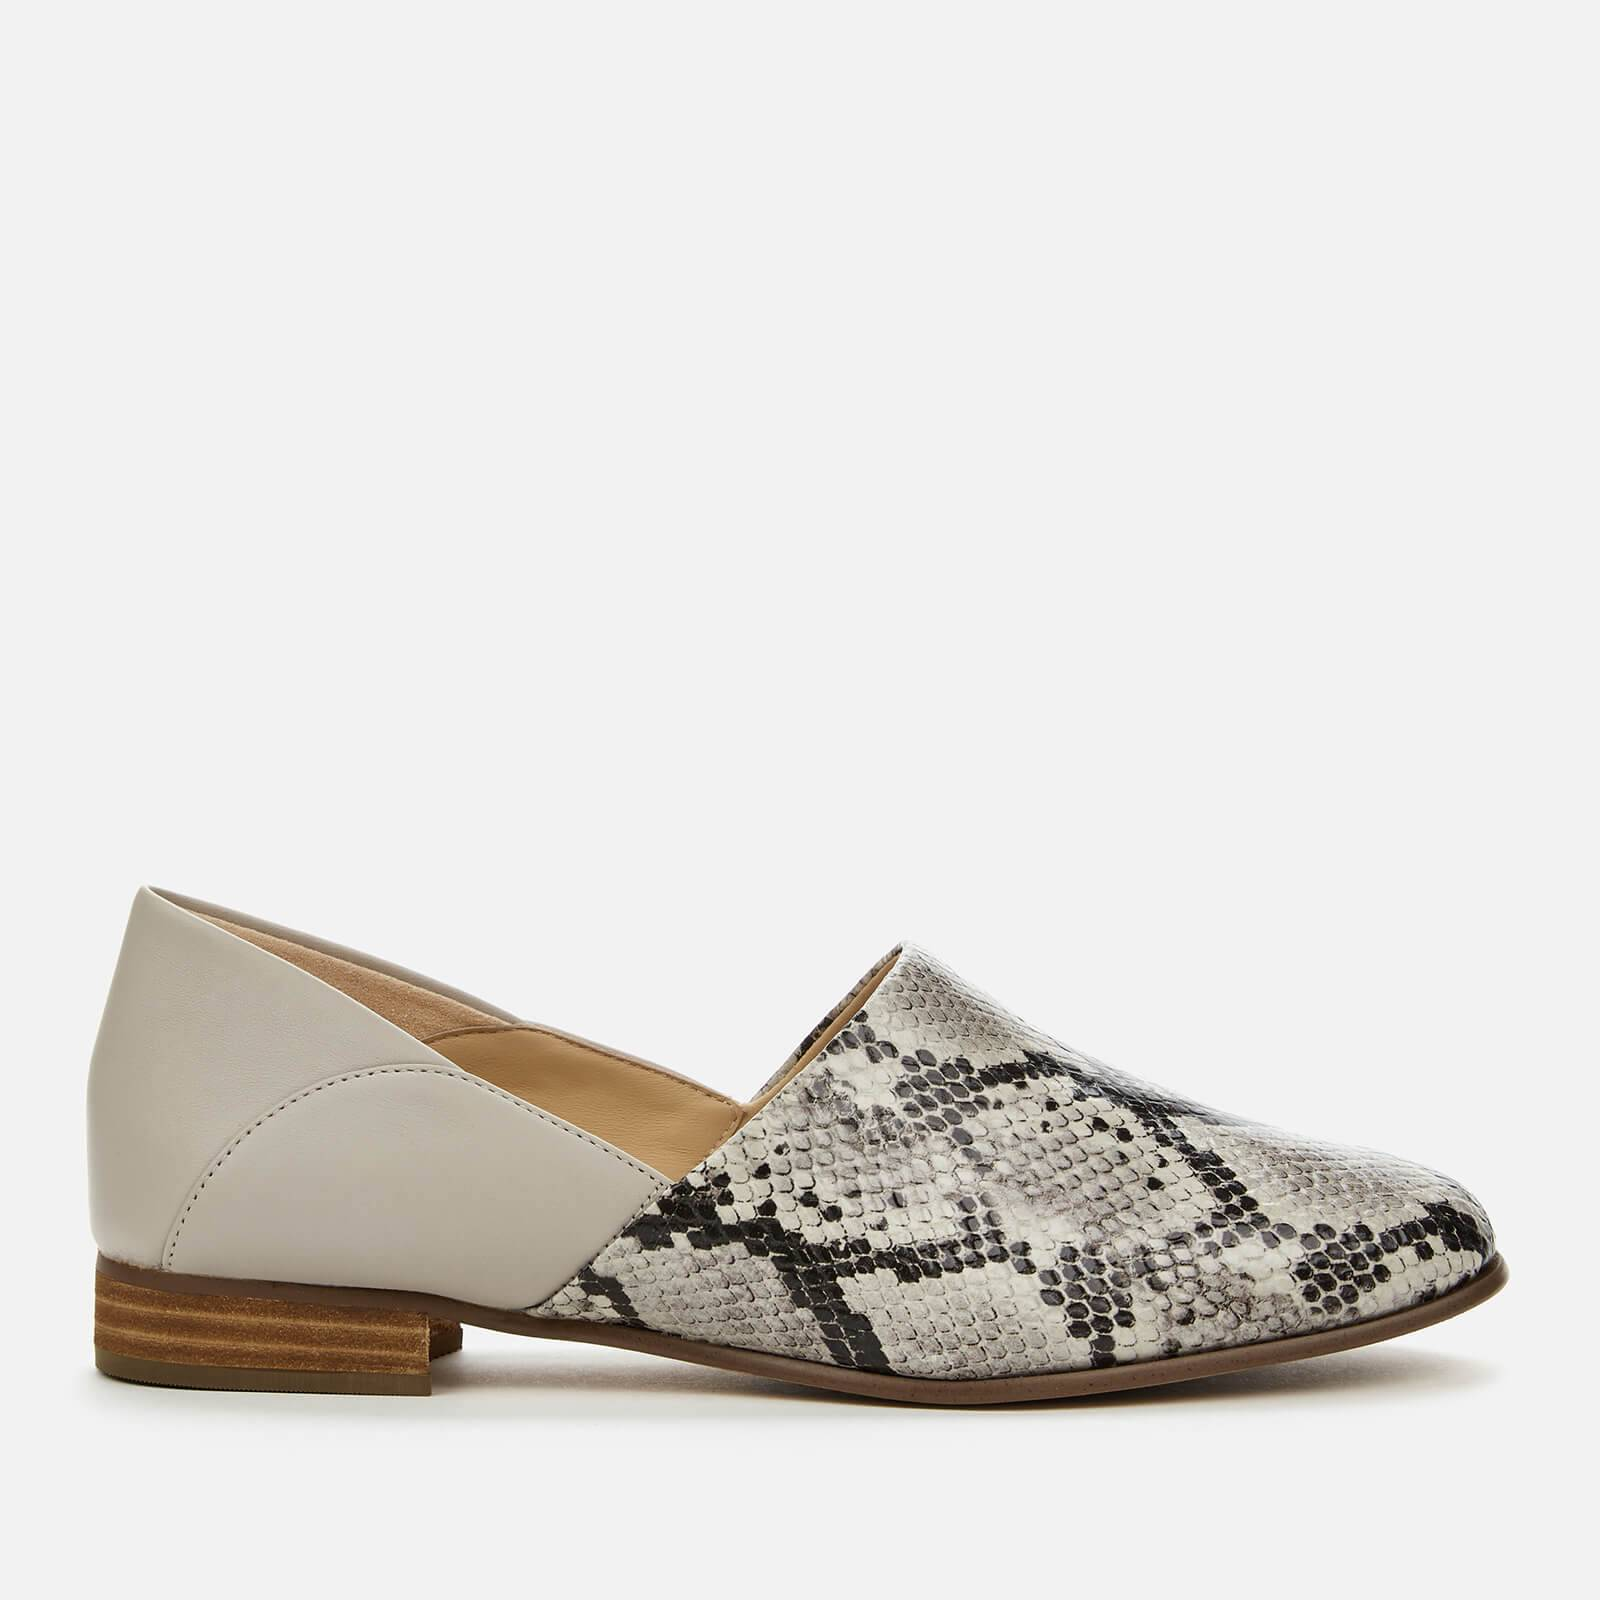 Clarks Women's Pure Tone Flat Shoes - Grey Snake - UK 7